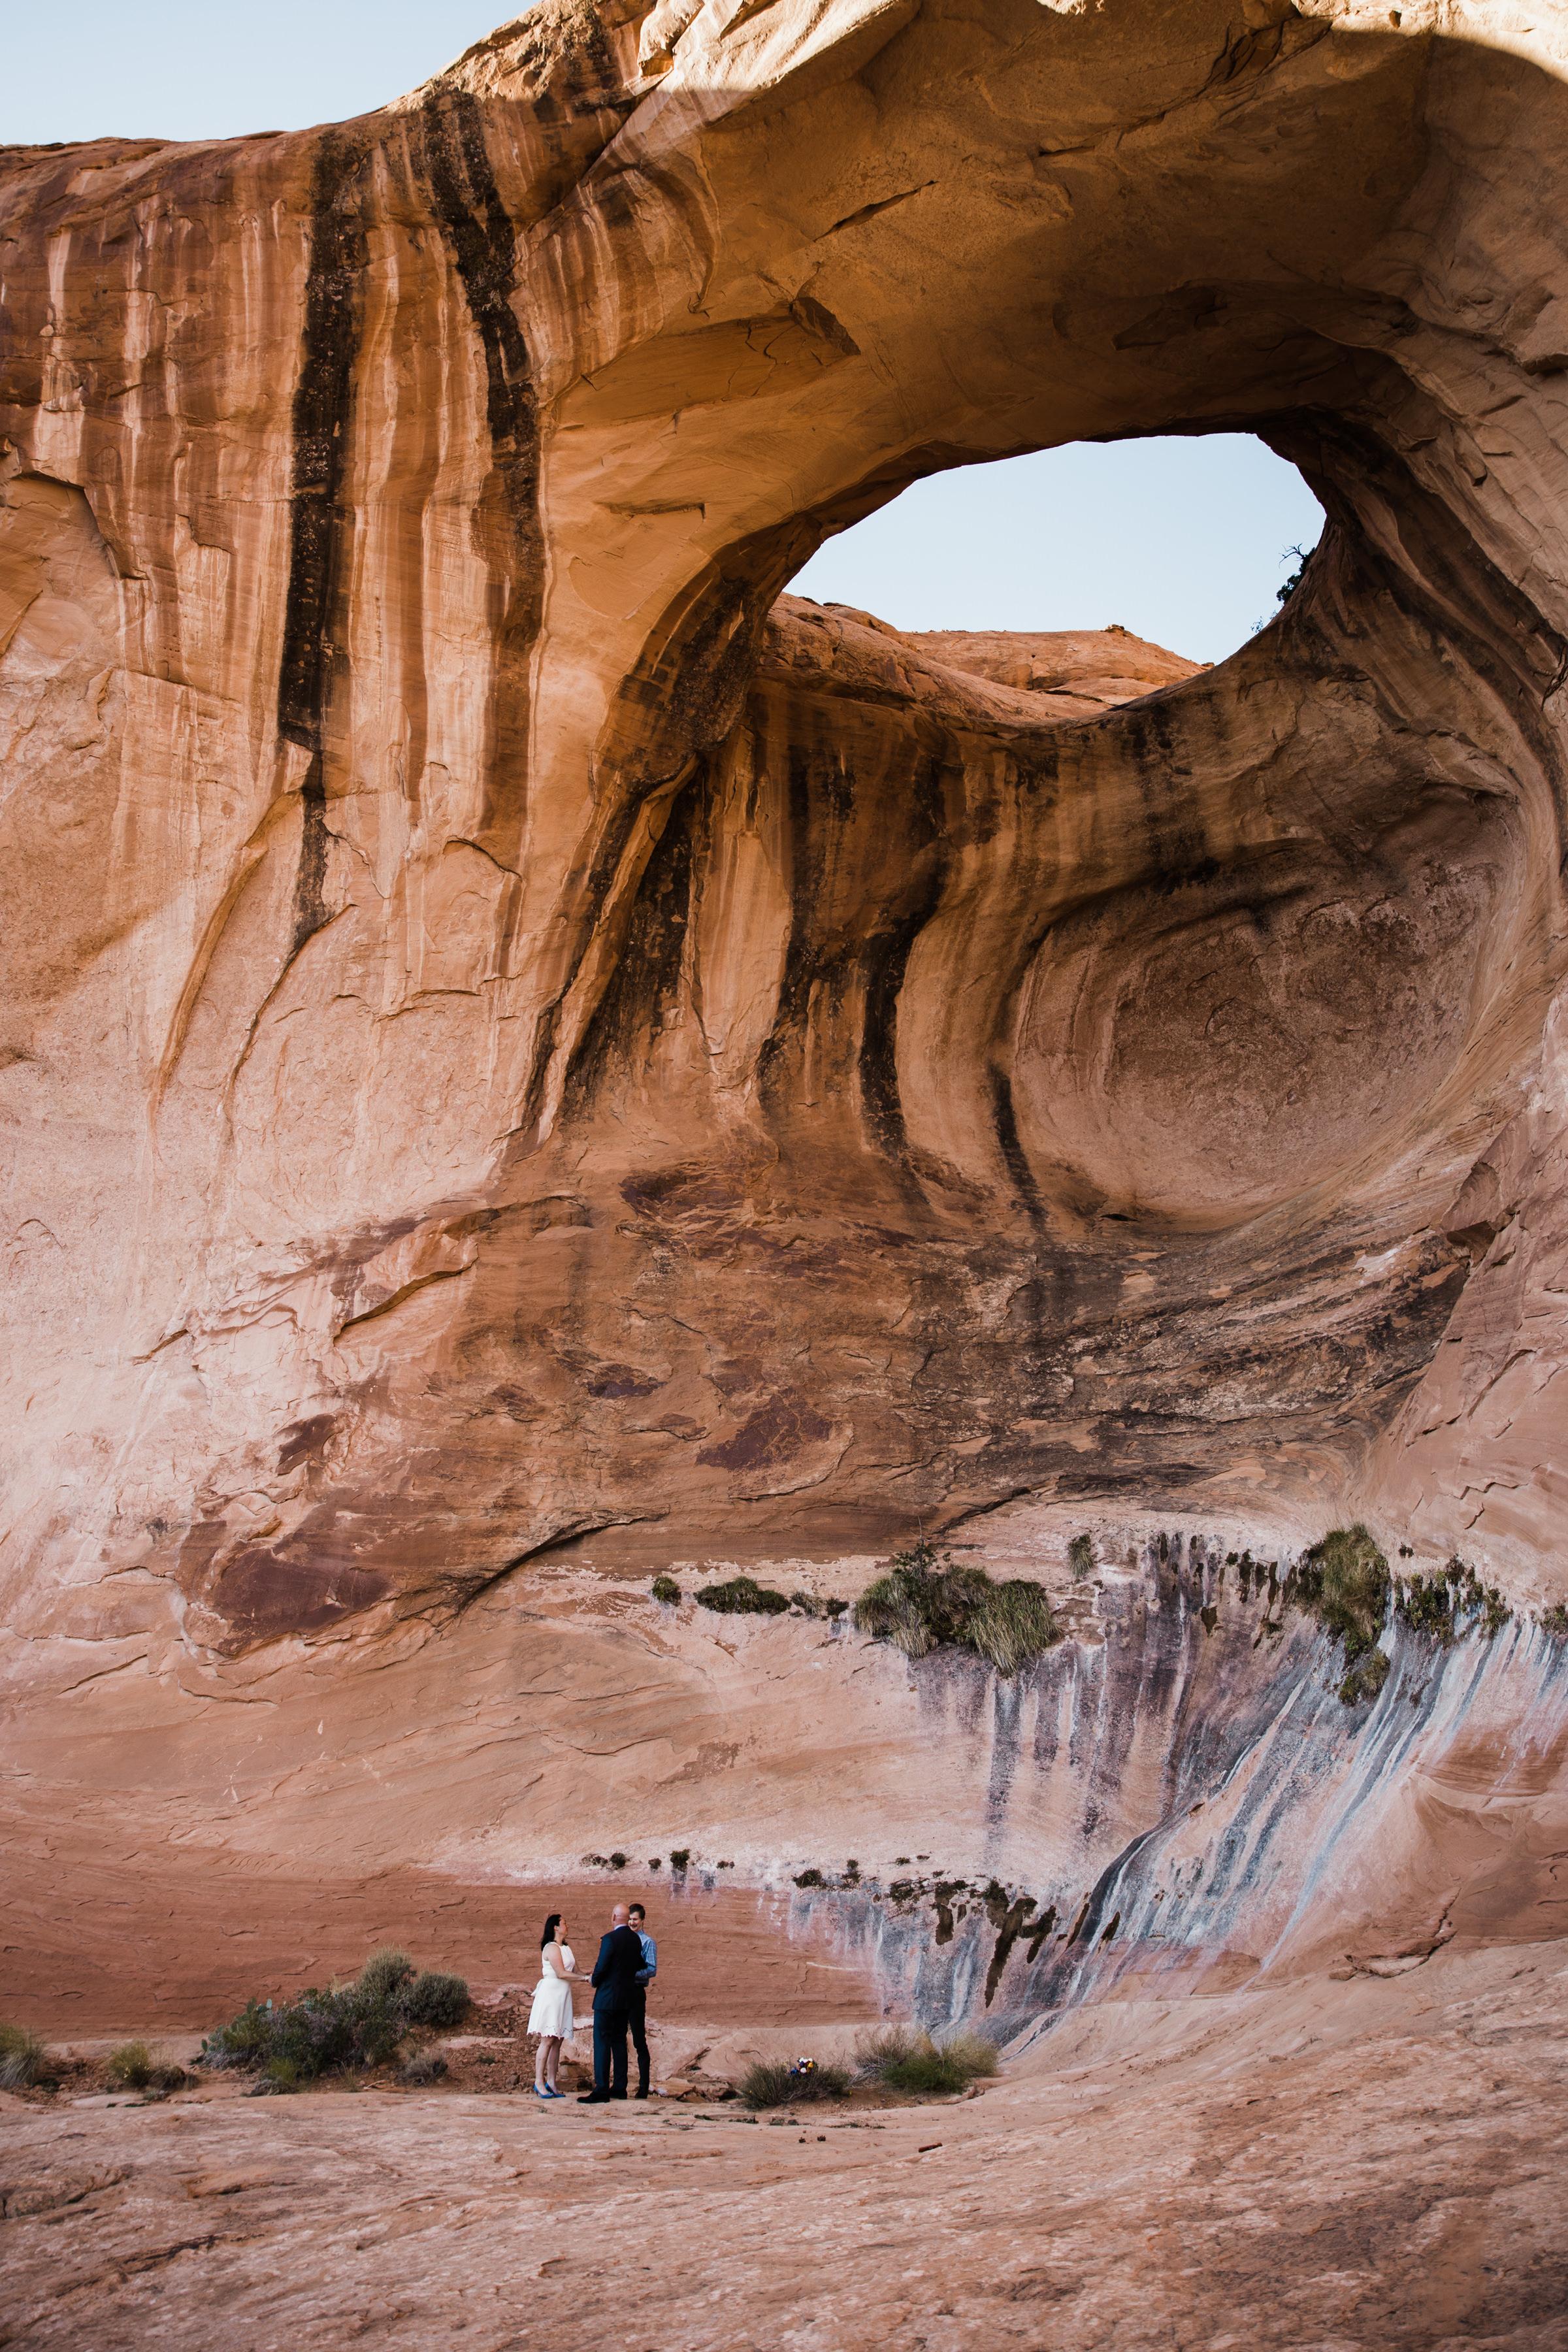 moab, utah hiking intimate elopement | destination adventure wedding photographers | the hearnes adventure photography | www.thehearnes.com